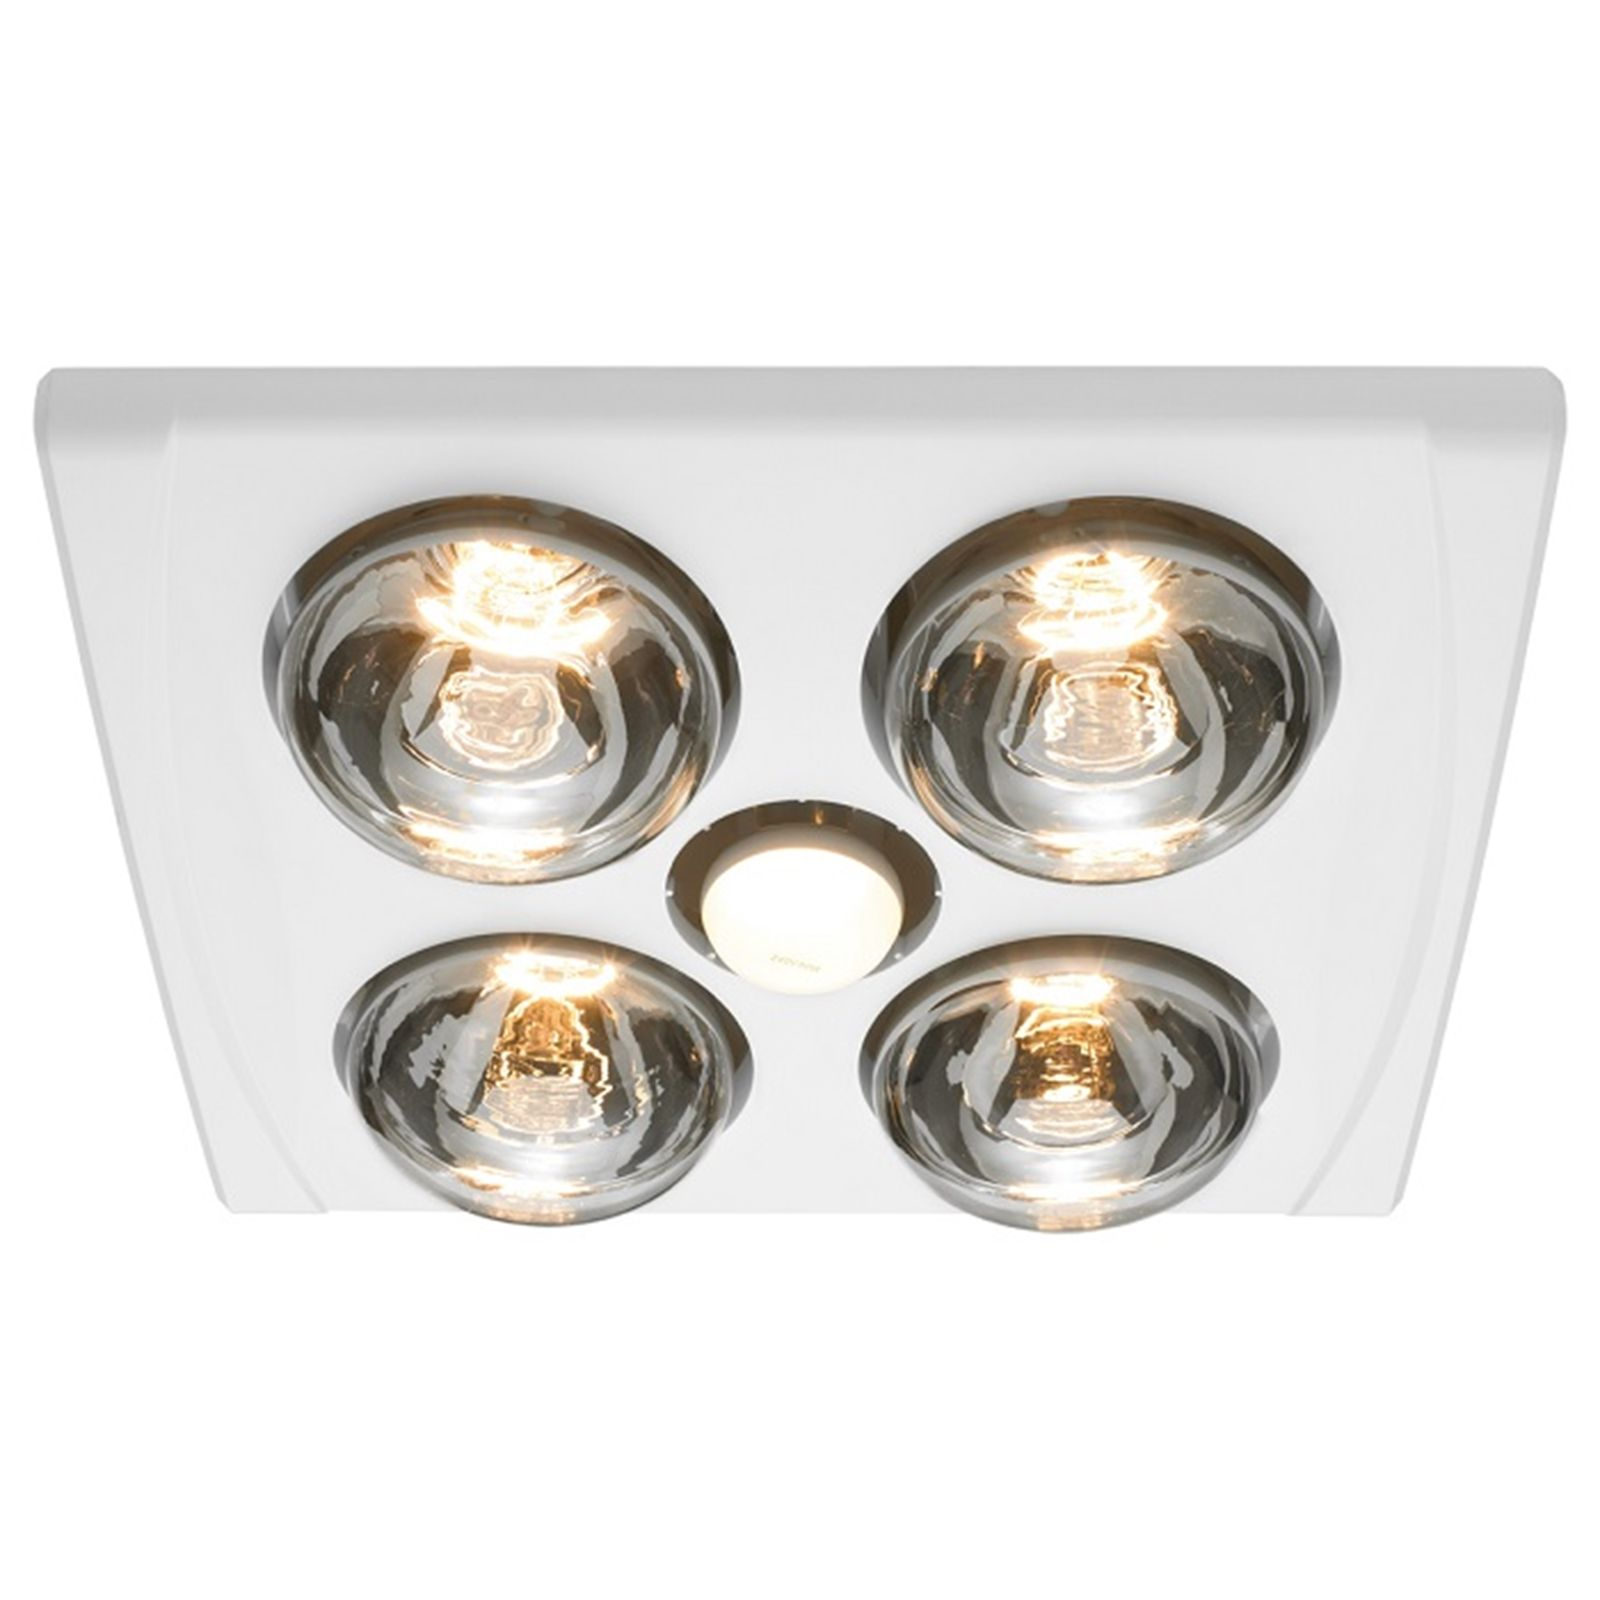 Heller 4 x 275W LED White Jack 3in1 Bathroom Heater ...